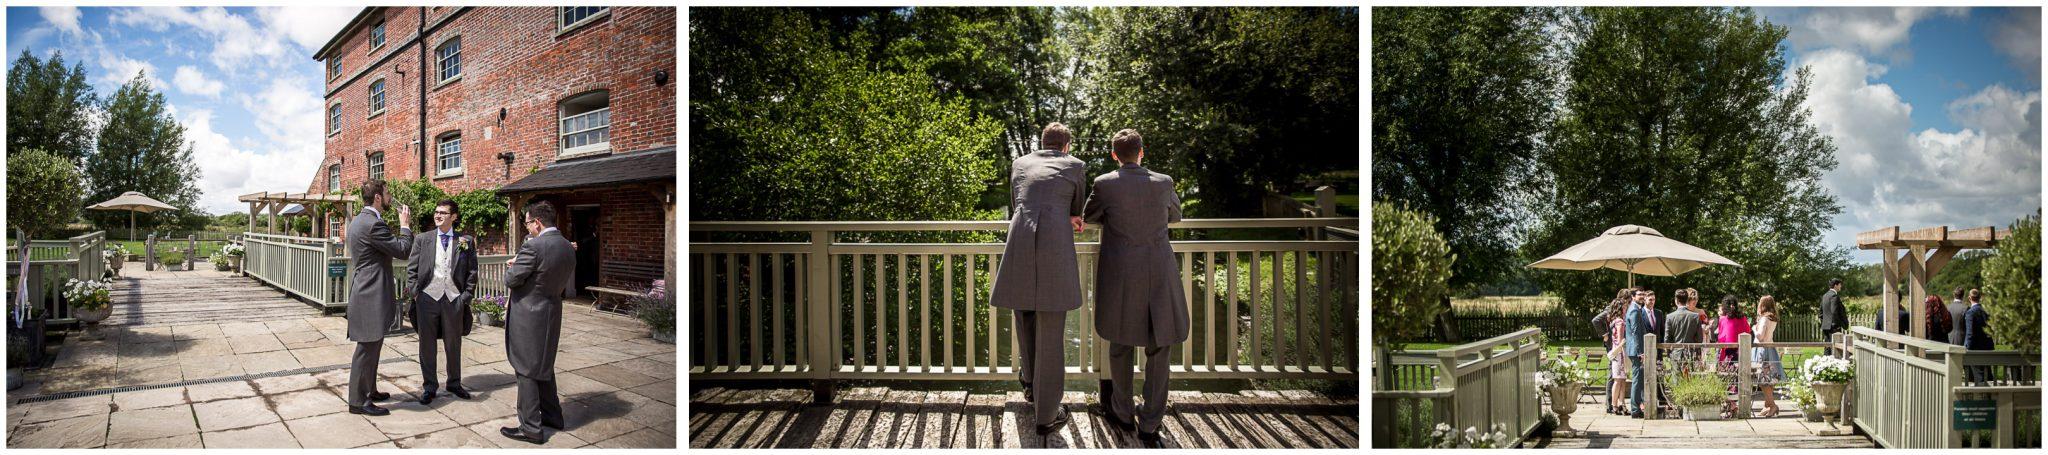 Sopley Mill wedding photography groomsmen await guest arrival